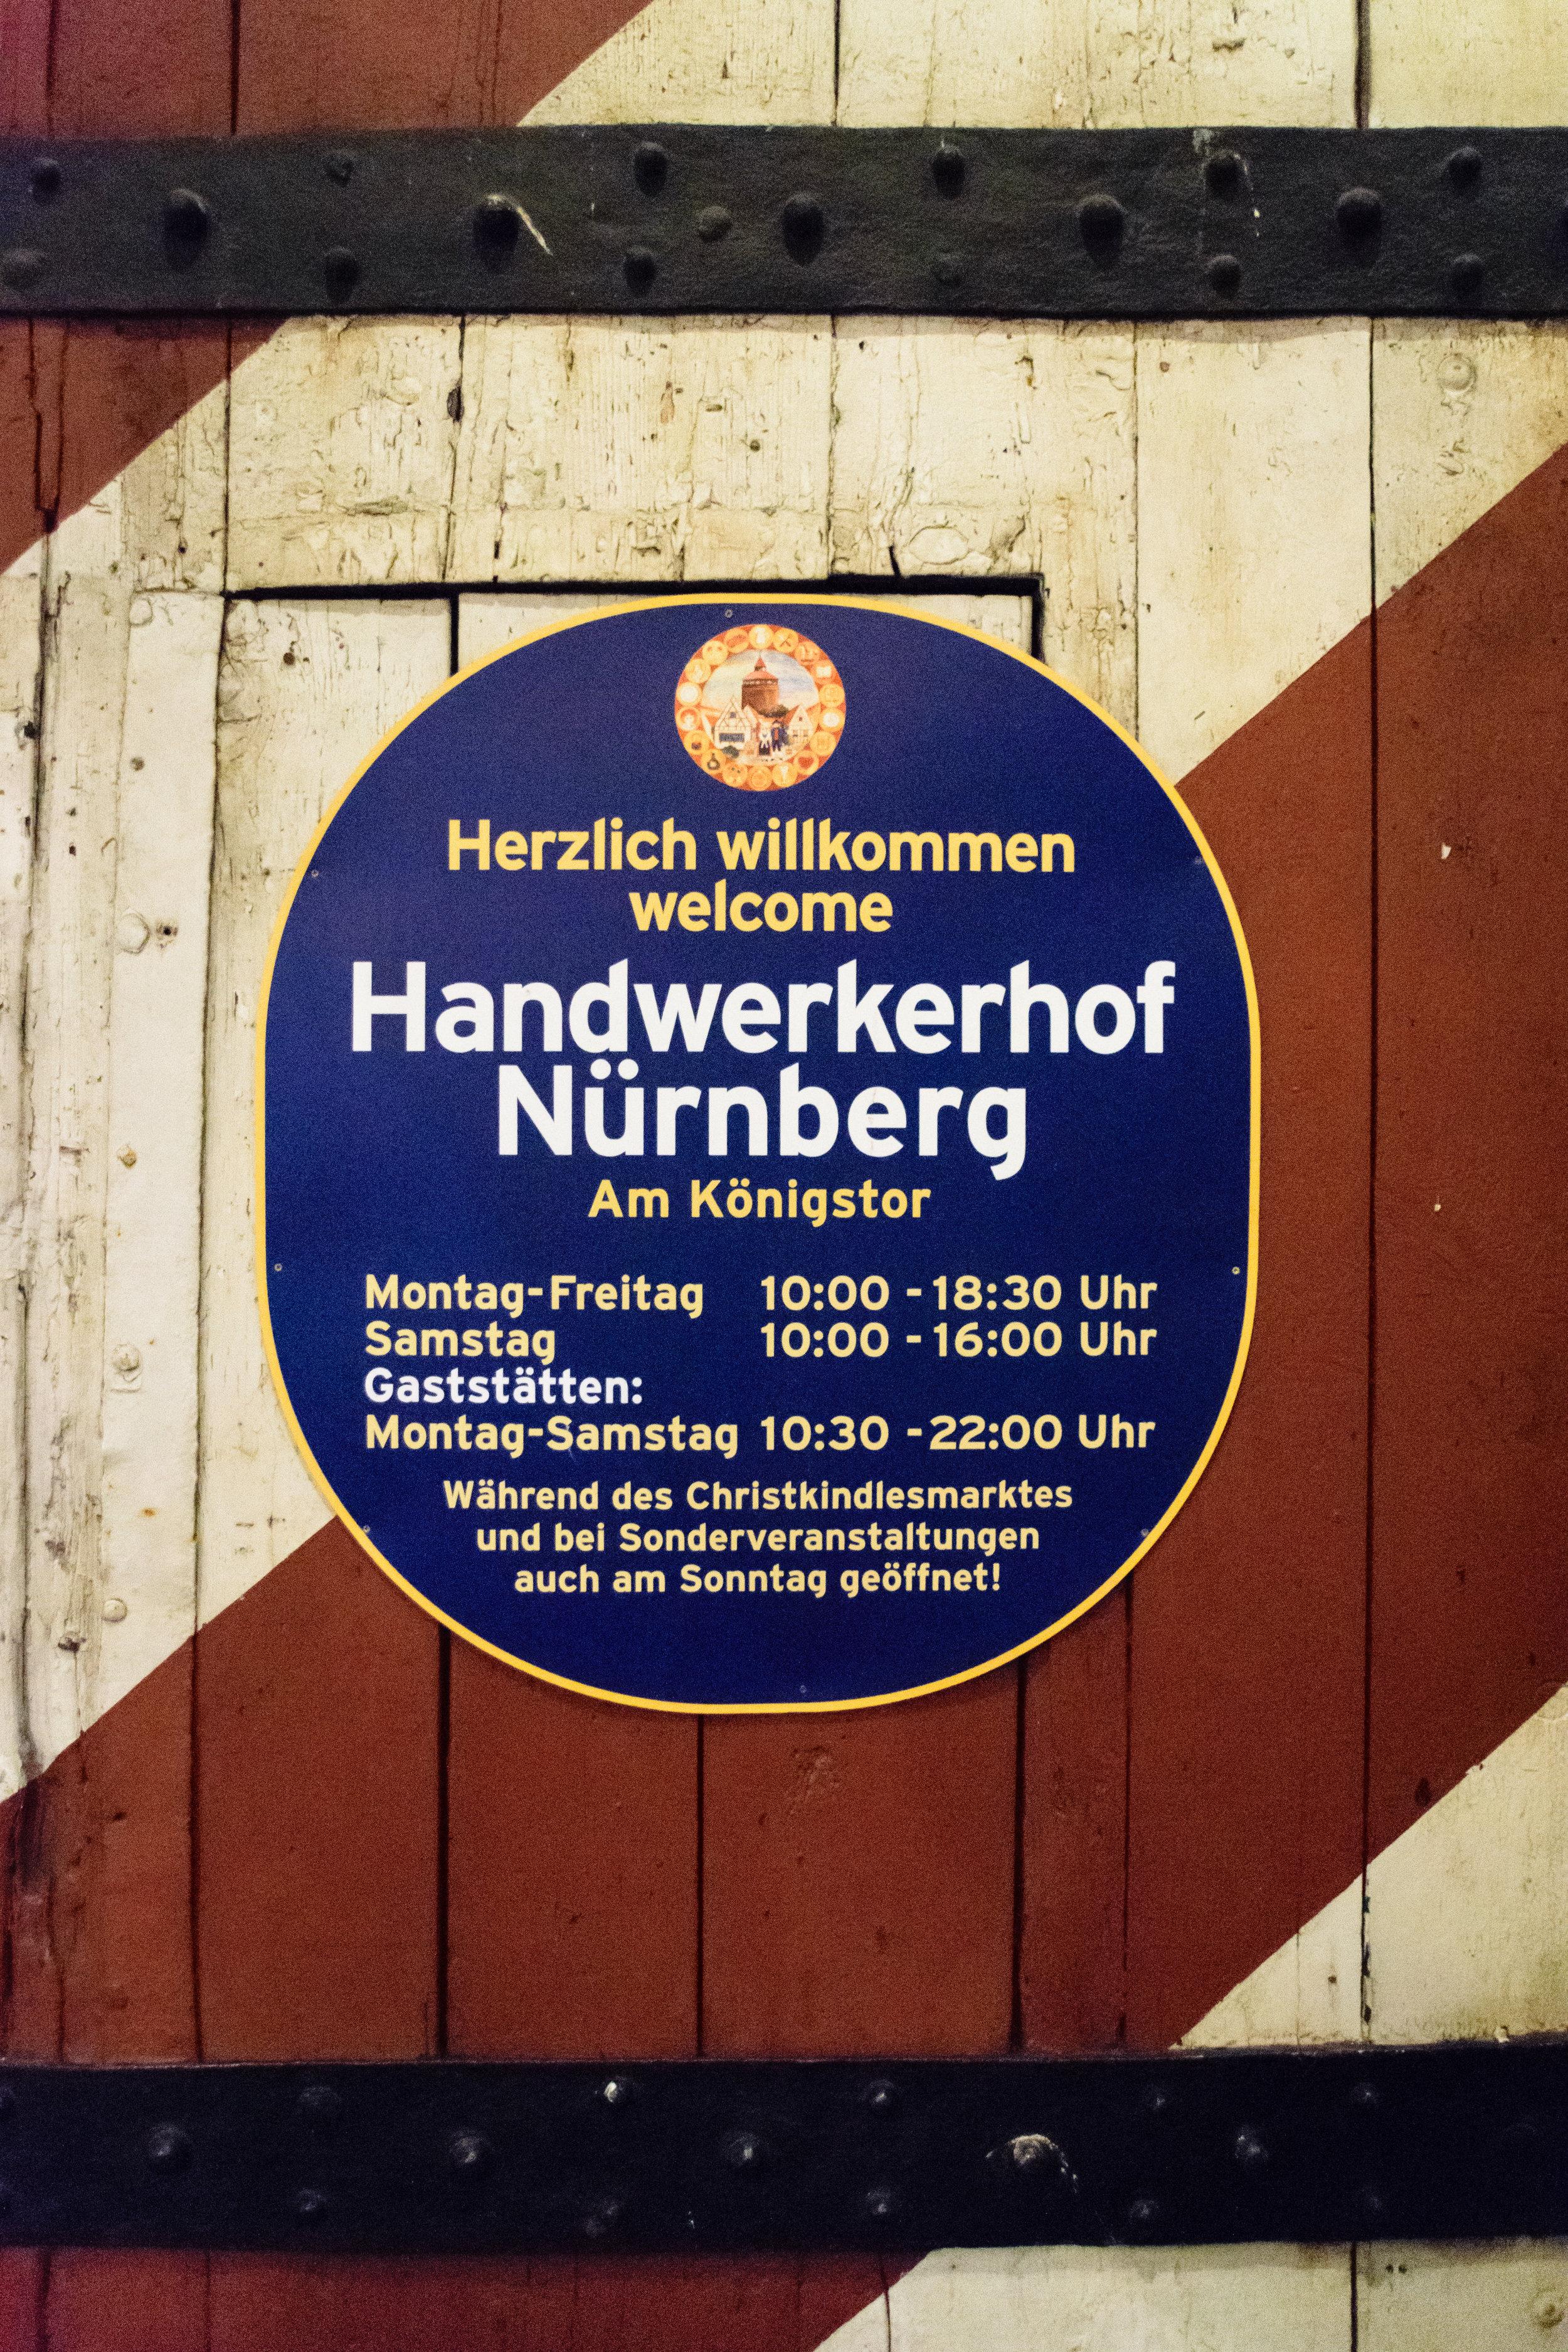 medieval shopping & traditional crafts at Handwerkerhof Nürnberg